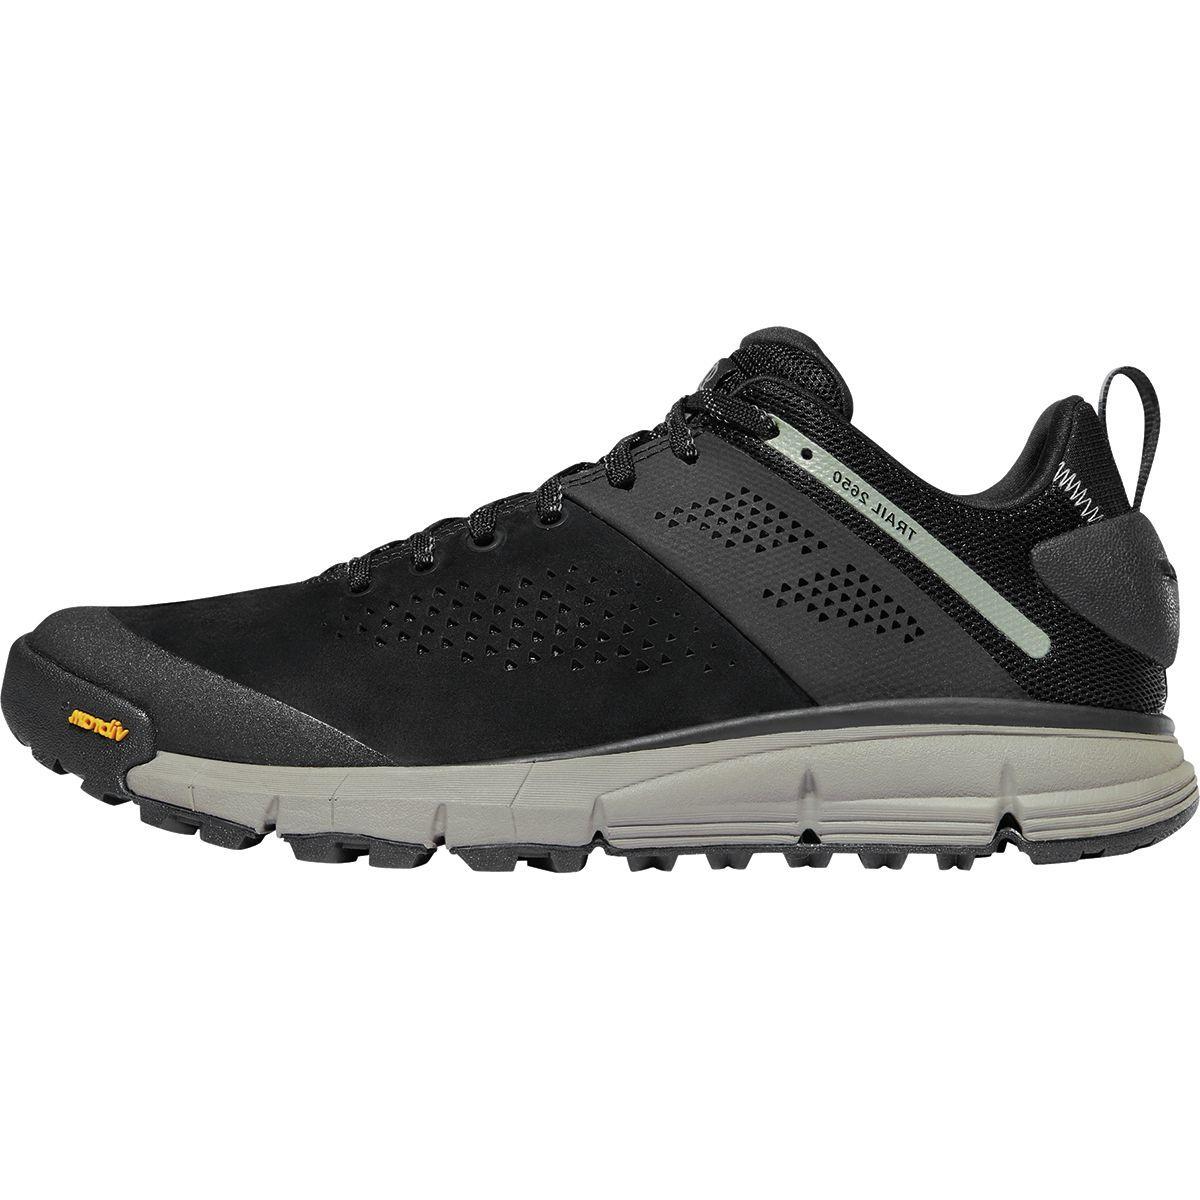 Danner Trail 2650 Hiking Shoe - Men's